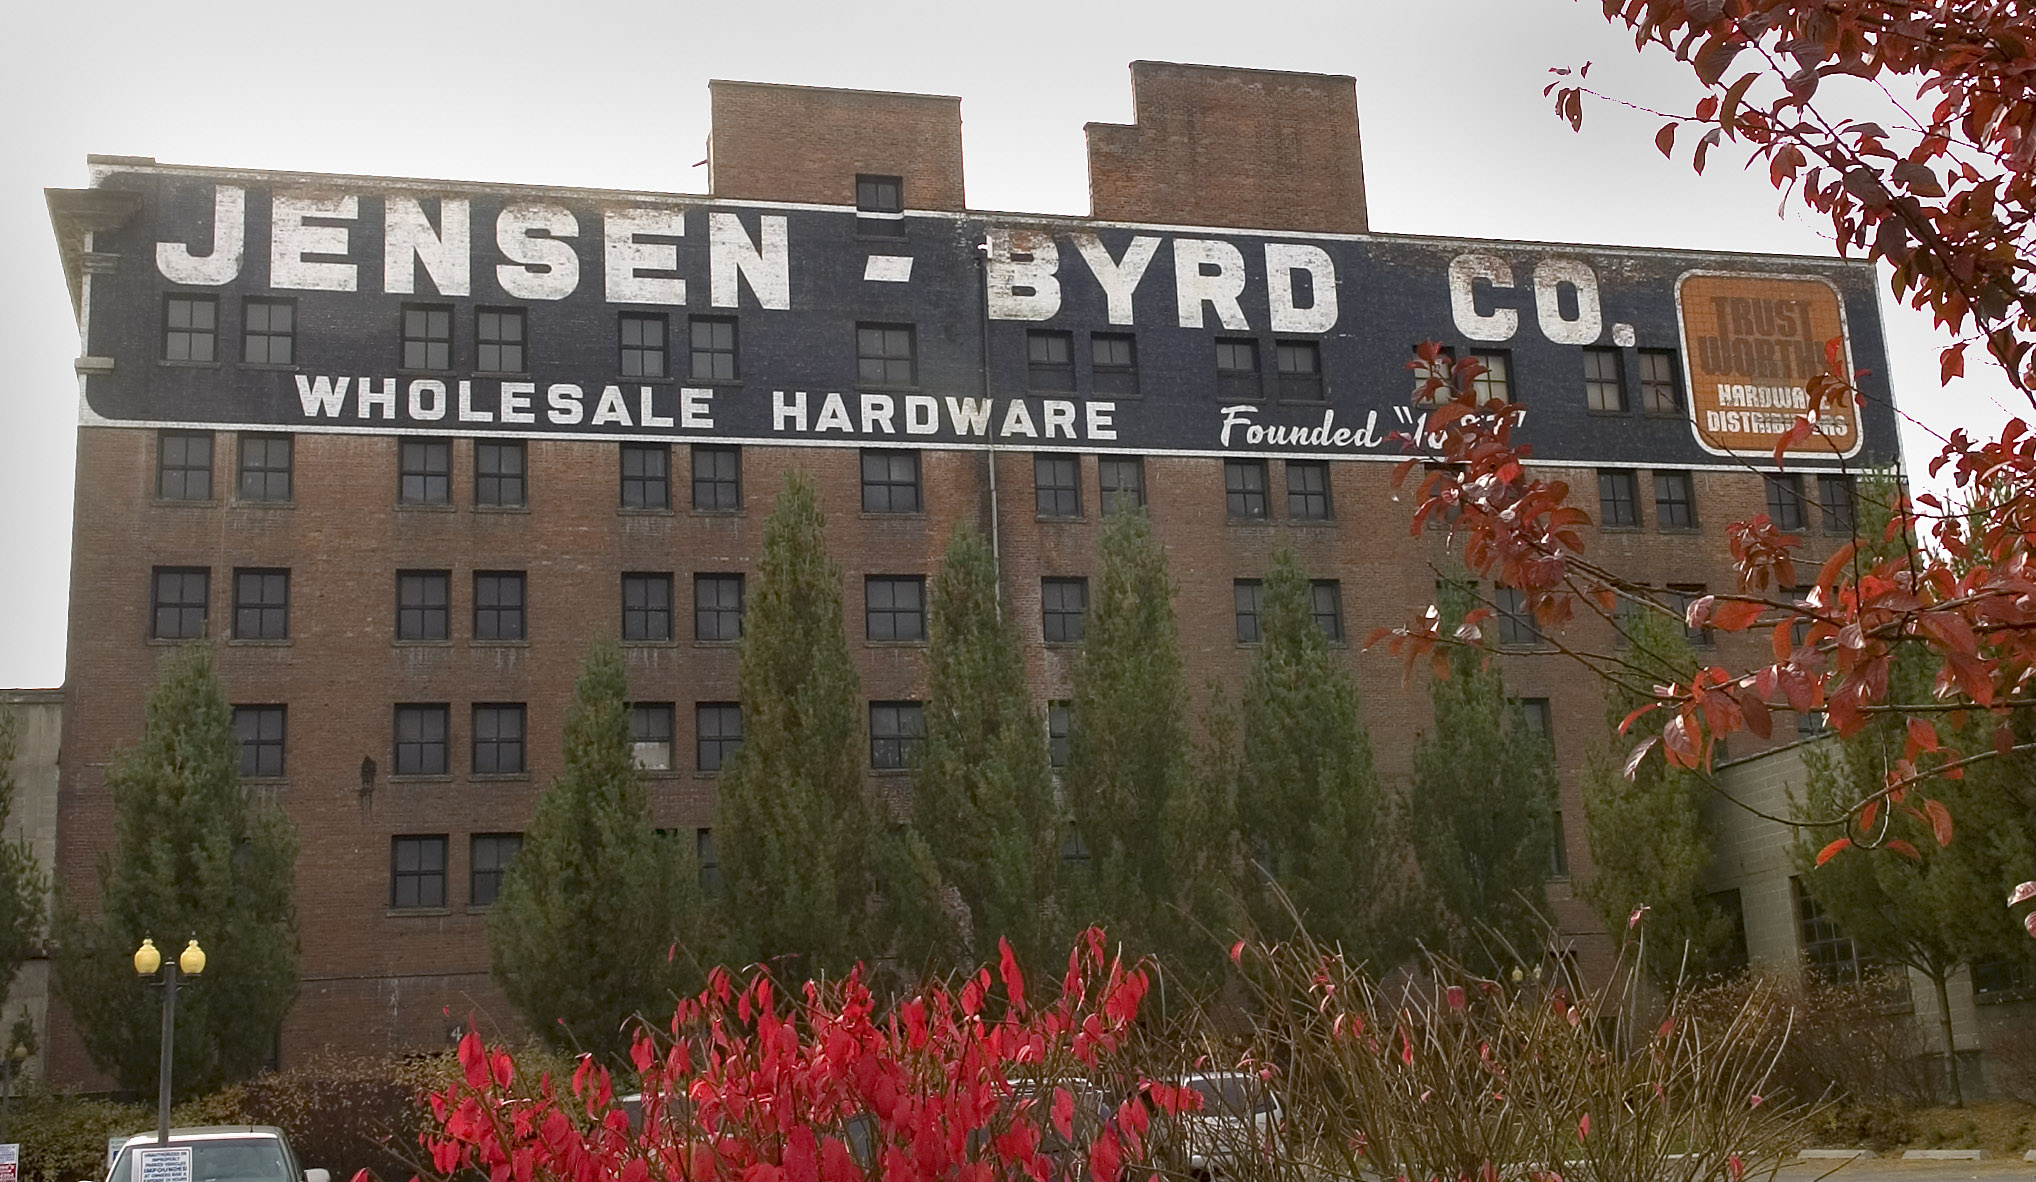 Jensen Byrd Building Will Be Renovated By Wsu Spokane The